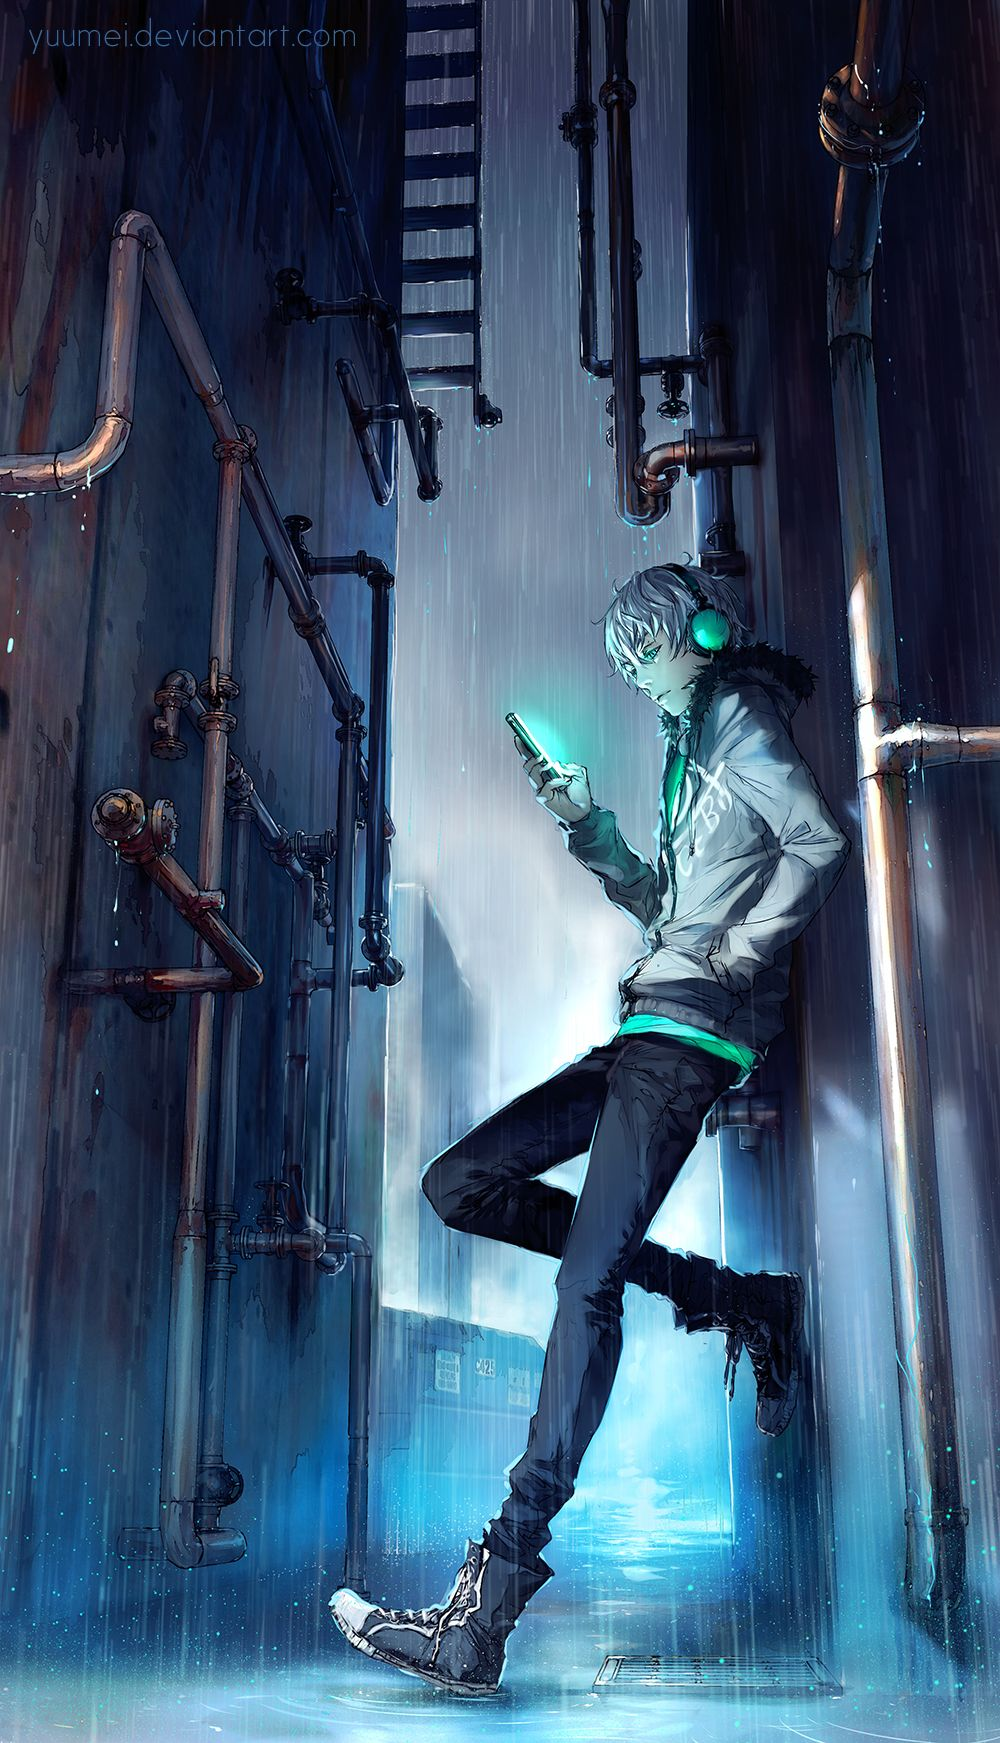 Under Rain By Yuumei Cyberpunk Art Gosstudio We Recommend Gift Shop Http Www Zazzle Com Vintagestylestudio Kawaii Anime Anime Wallpaper Anime Art